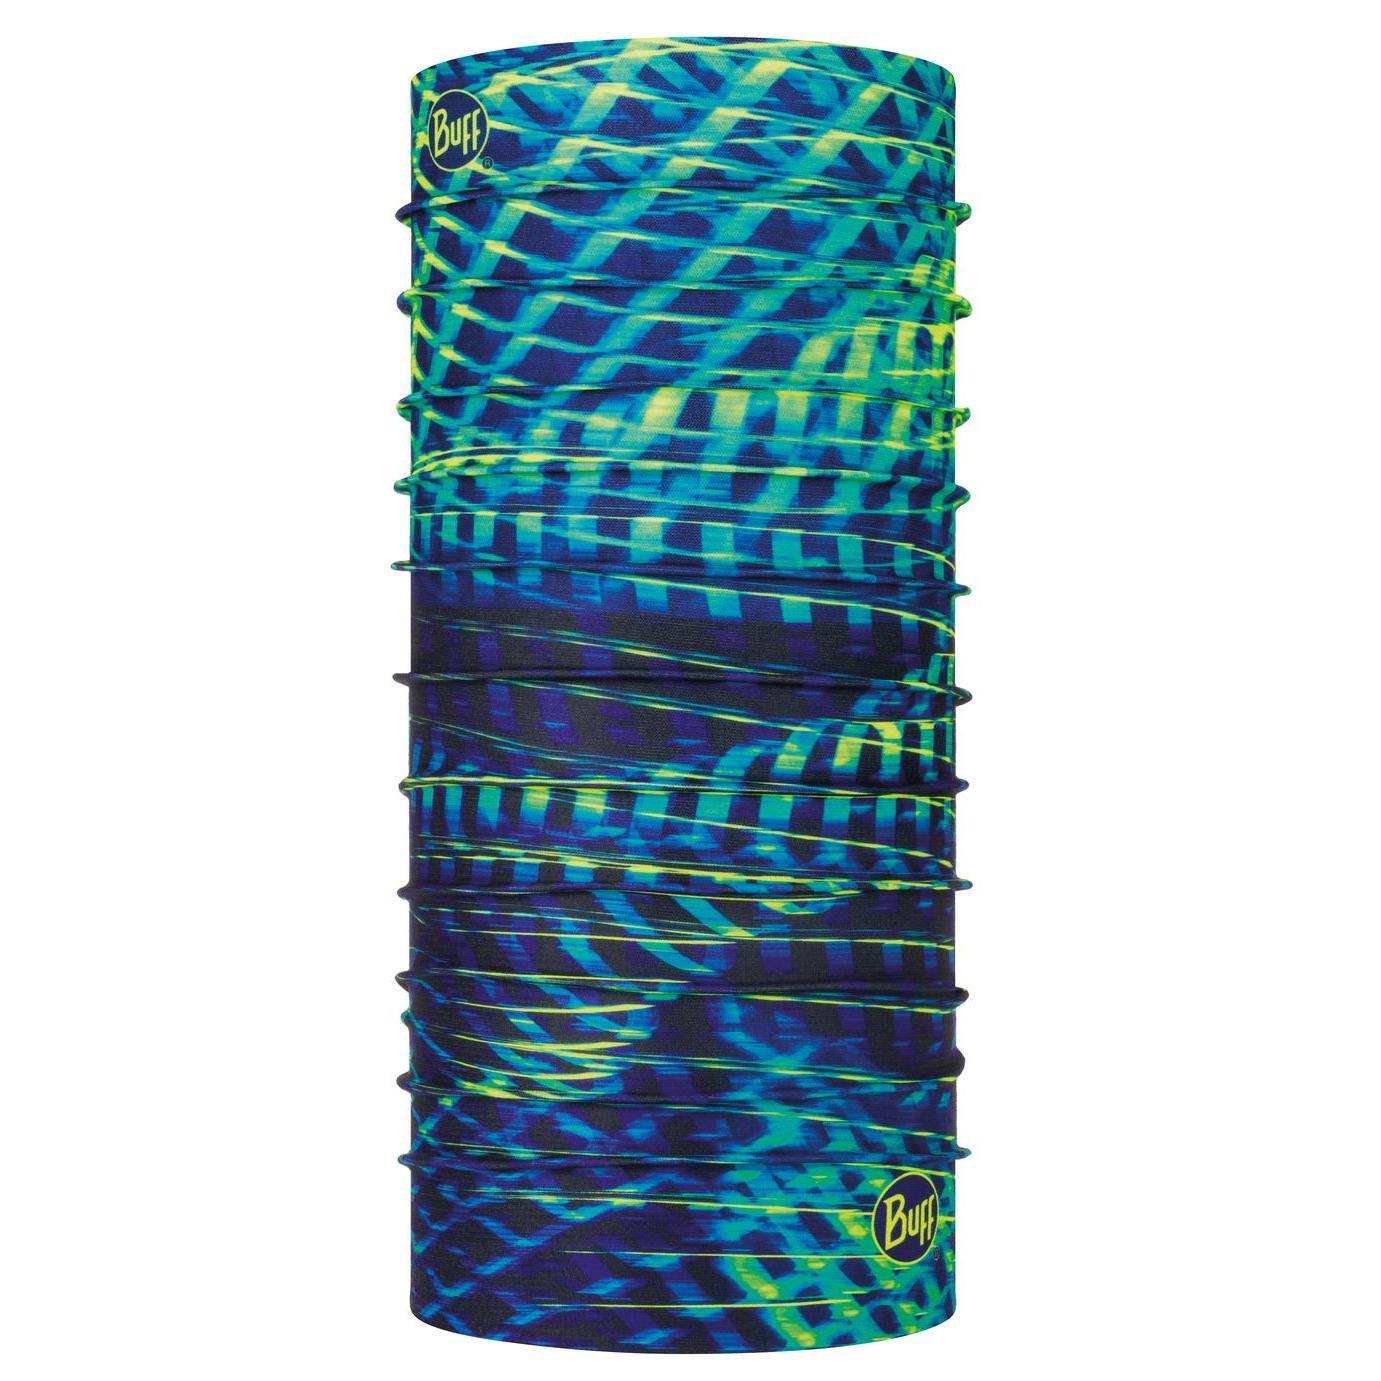 Бандана Buff Coolnet UV+Neckwear Sural Multi (122511.555.10.00)